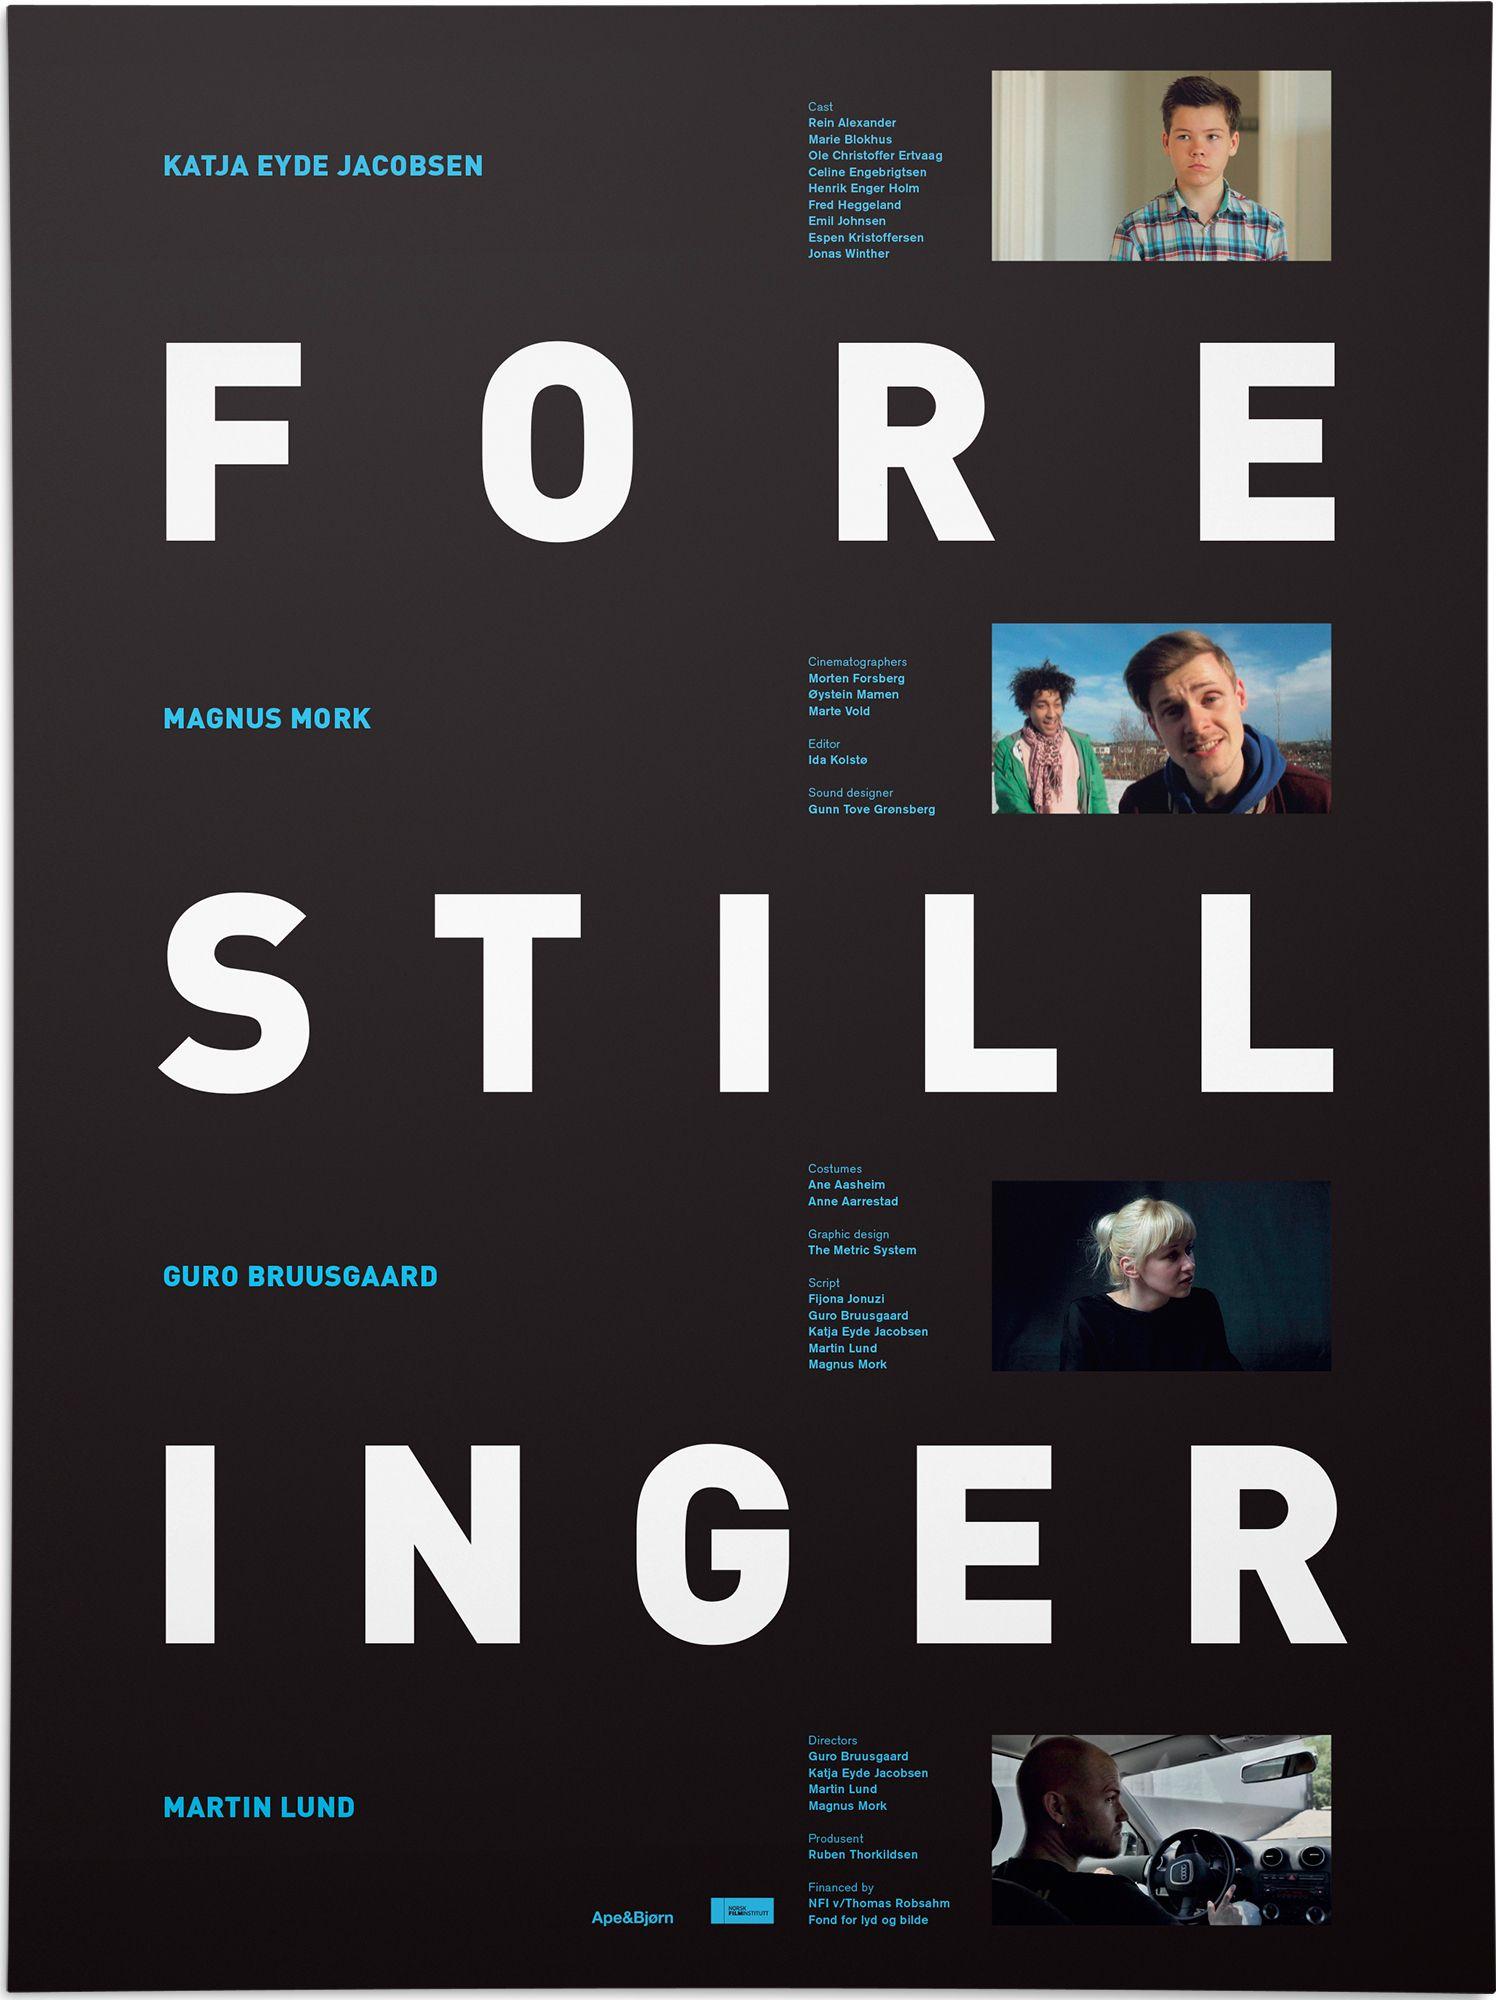 Forestillinger Poster With Images Metric System Sign Design Poster